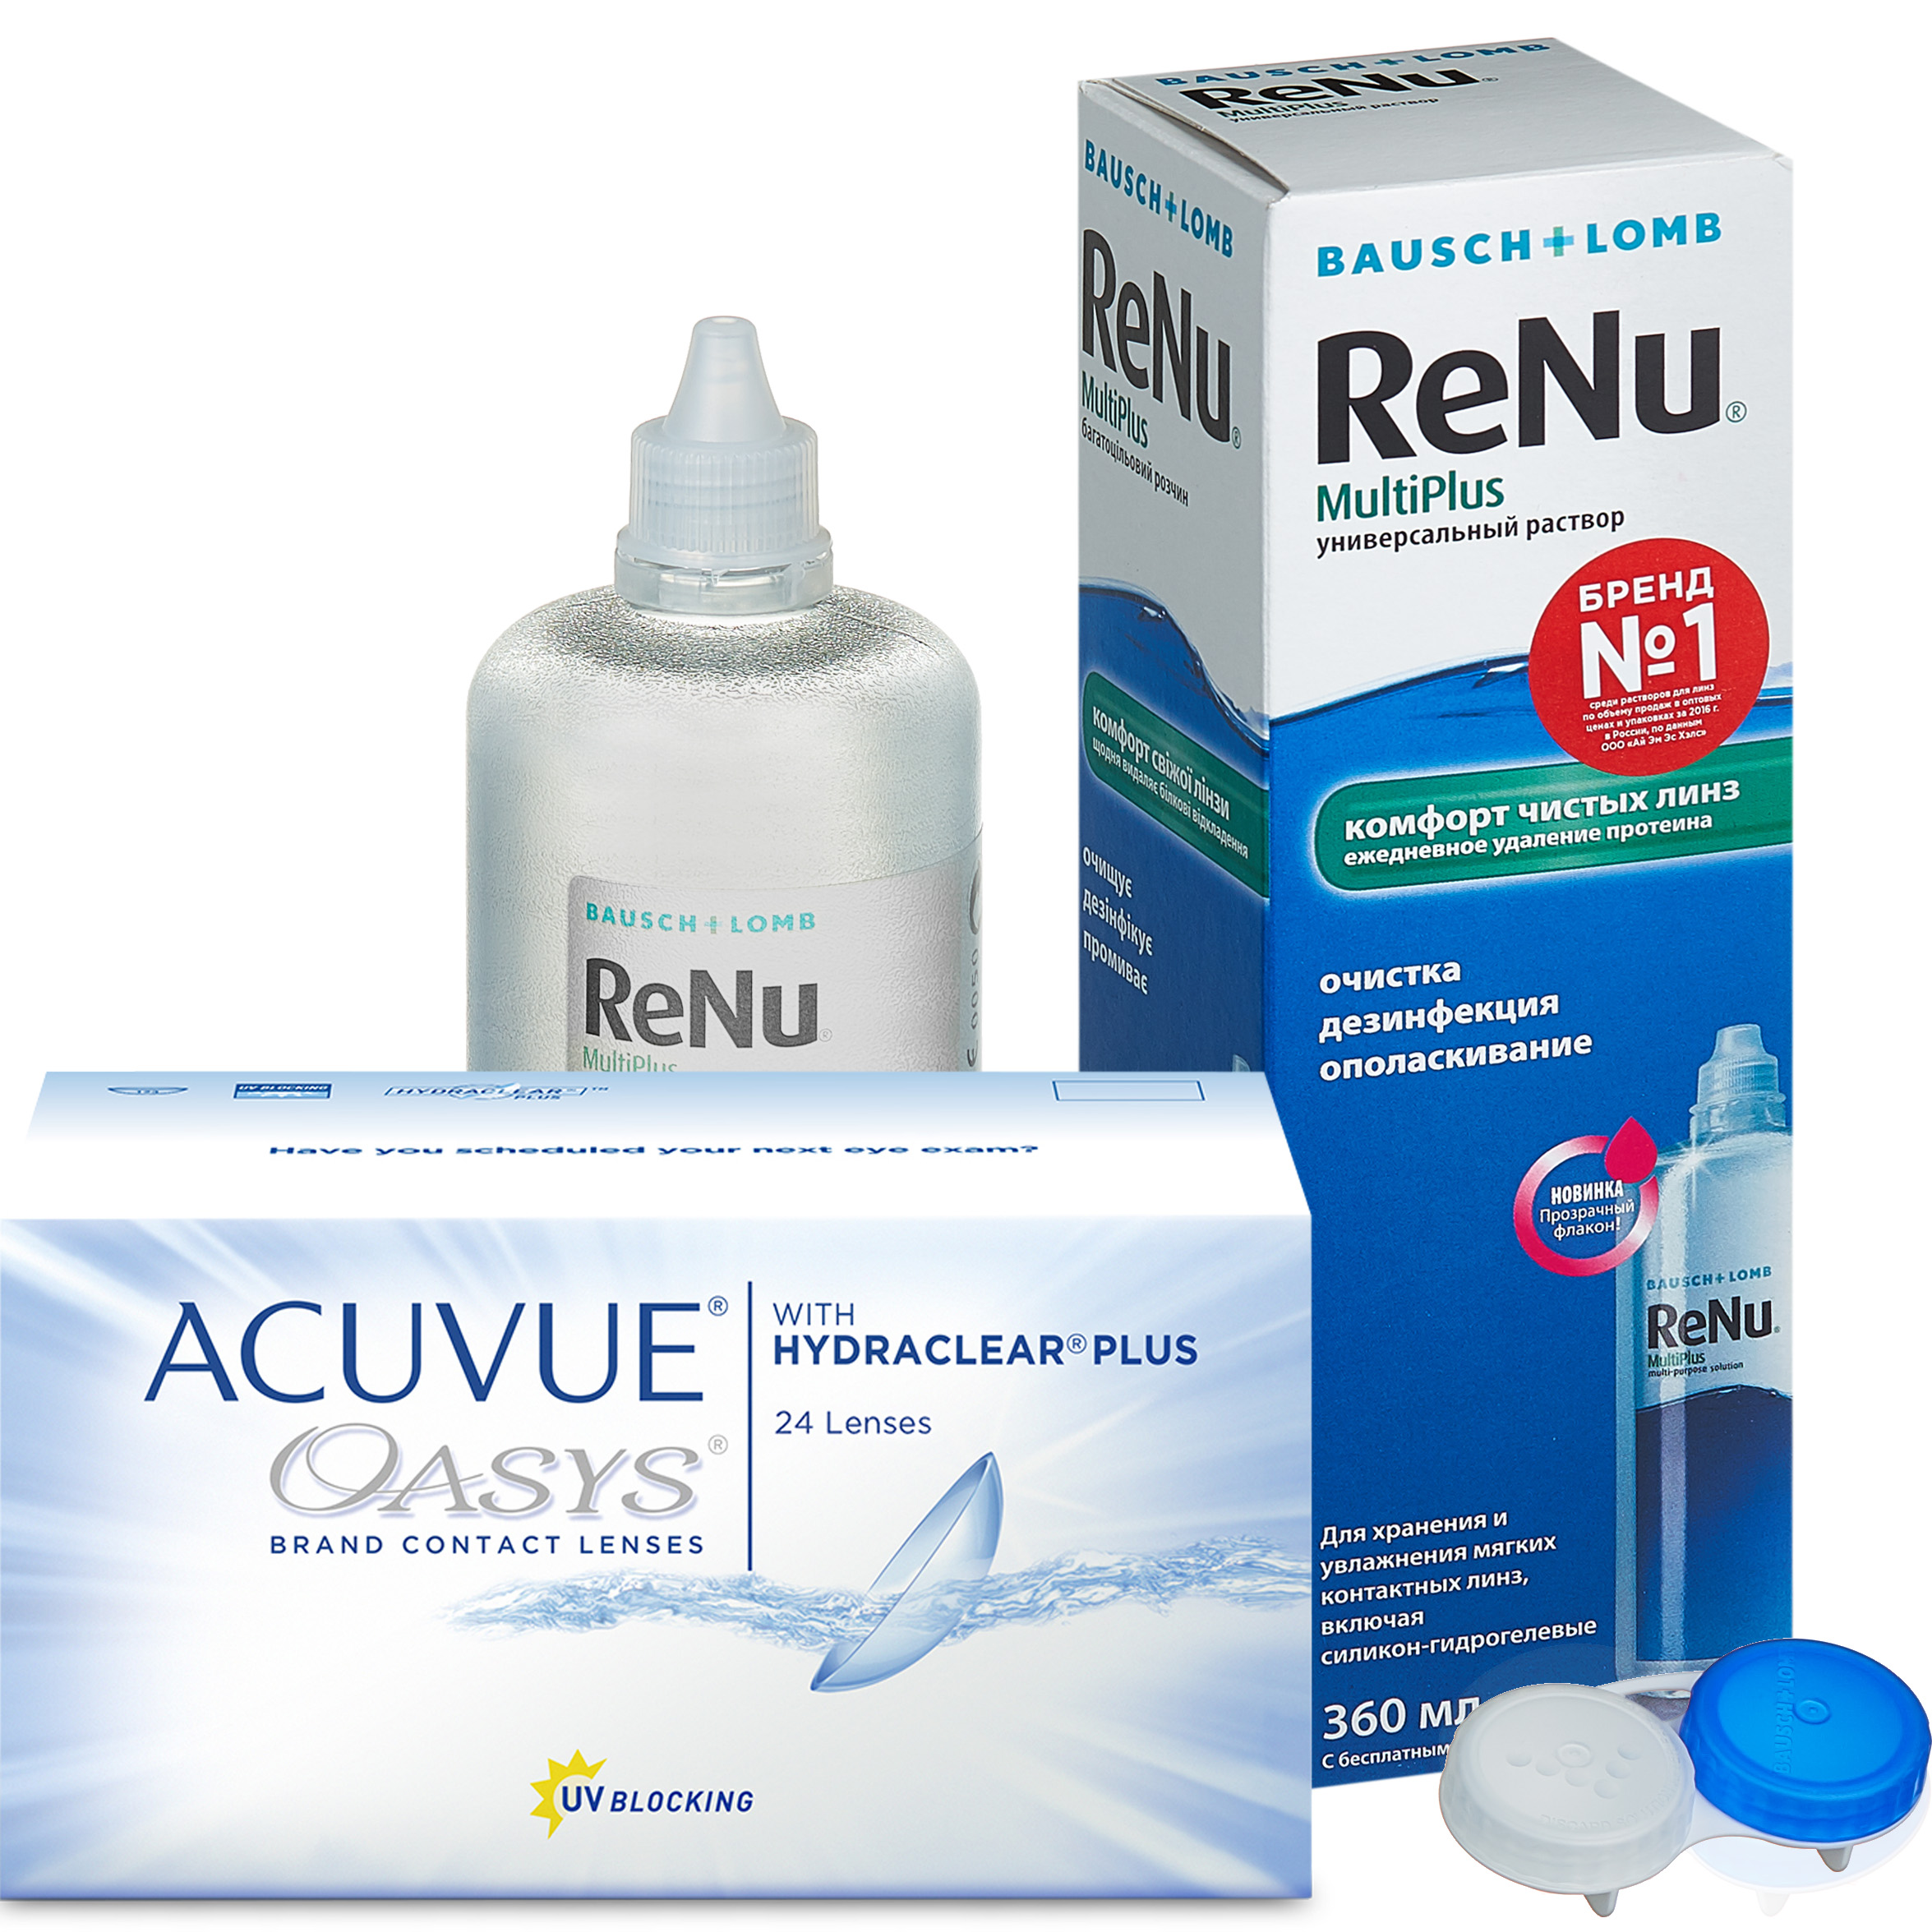 Купить Oasys with Hydraclear Plus 24 линзы + ReNu MultiPlus, Линзы Acuvue Oasys with Hydraclear Plus 24 линзы R 8.4 -1, 00 + ReNu Multi Plus 360 мл